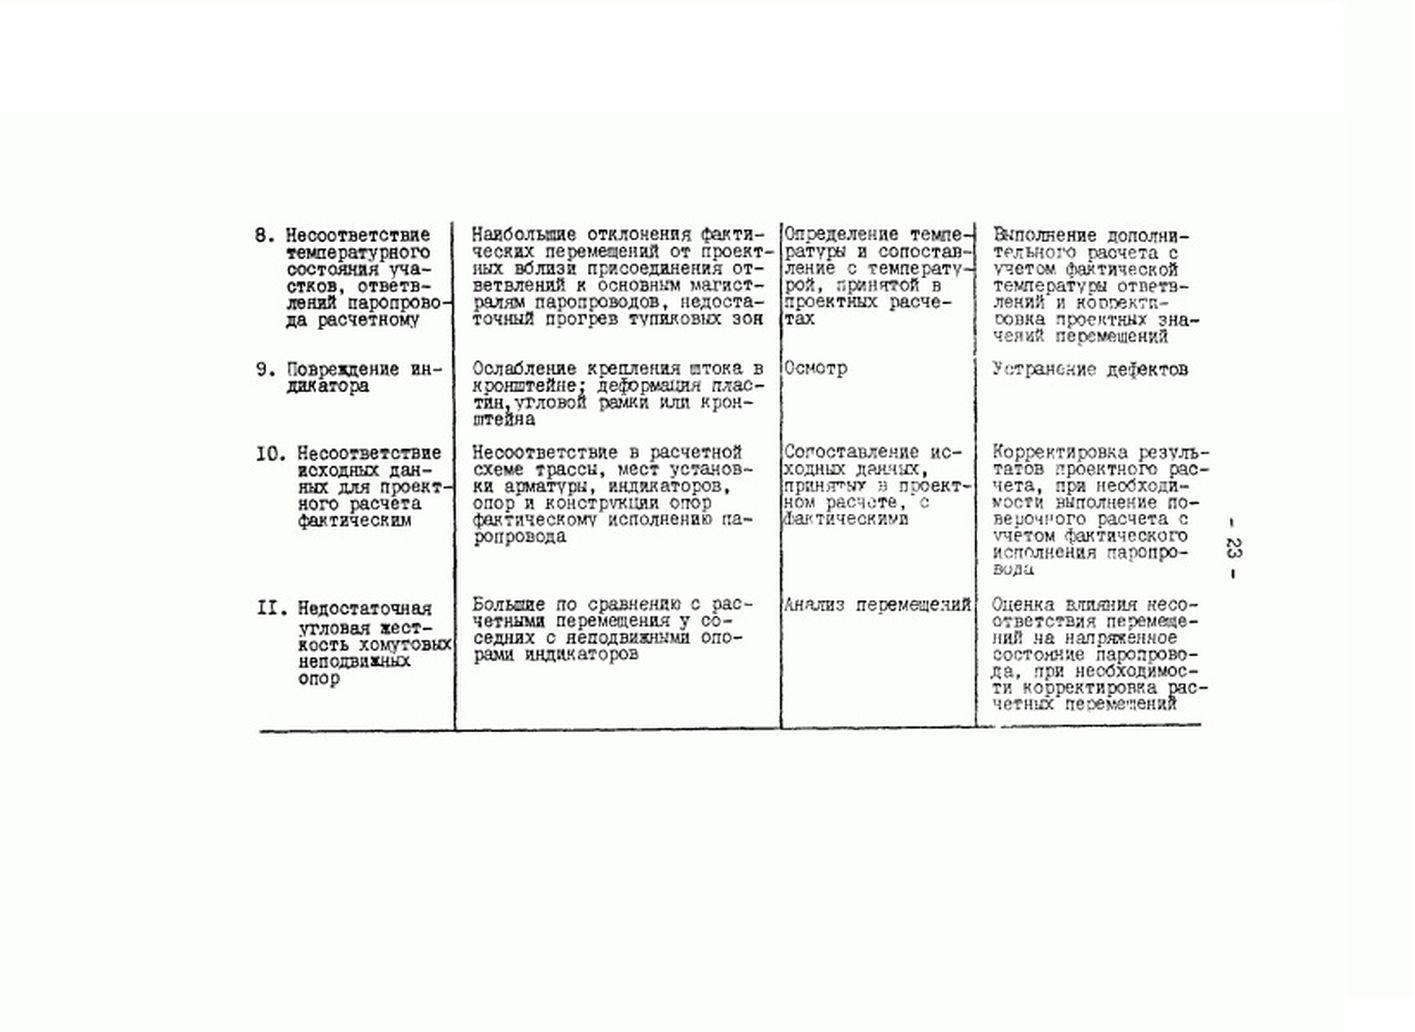 РД 34.39.301-87 стр.23